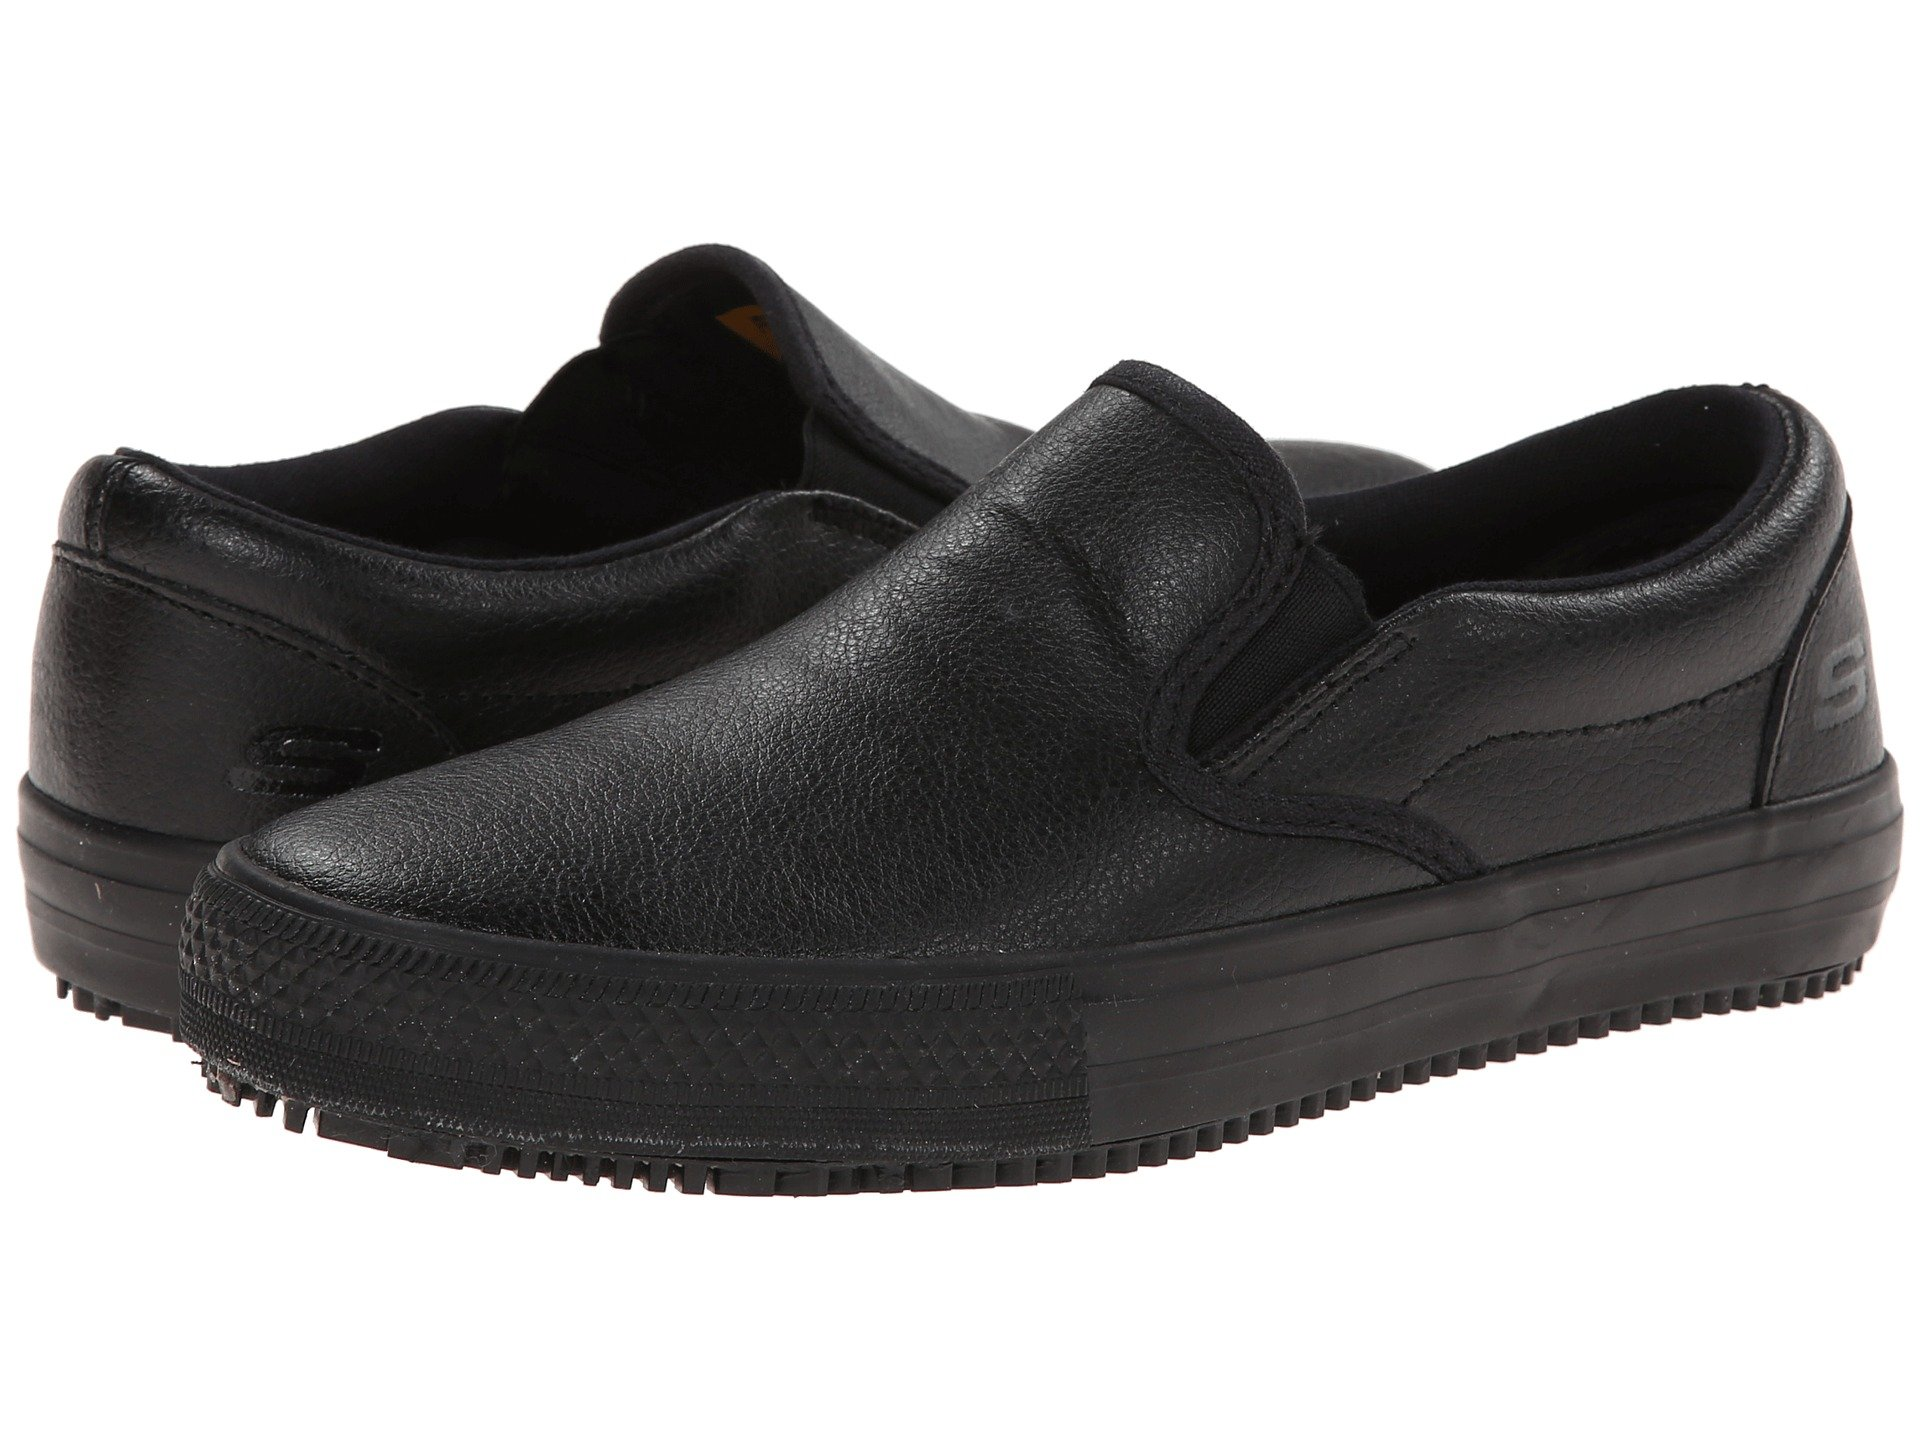 3a393442d7 Women's SKECHERS Work Shoes + FREE SHIPPING | Zappos.com